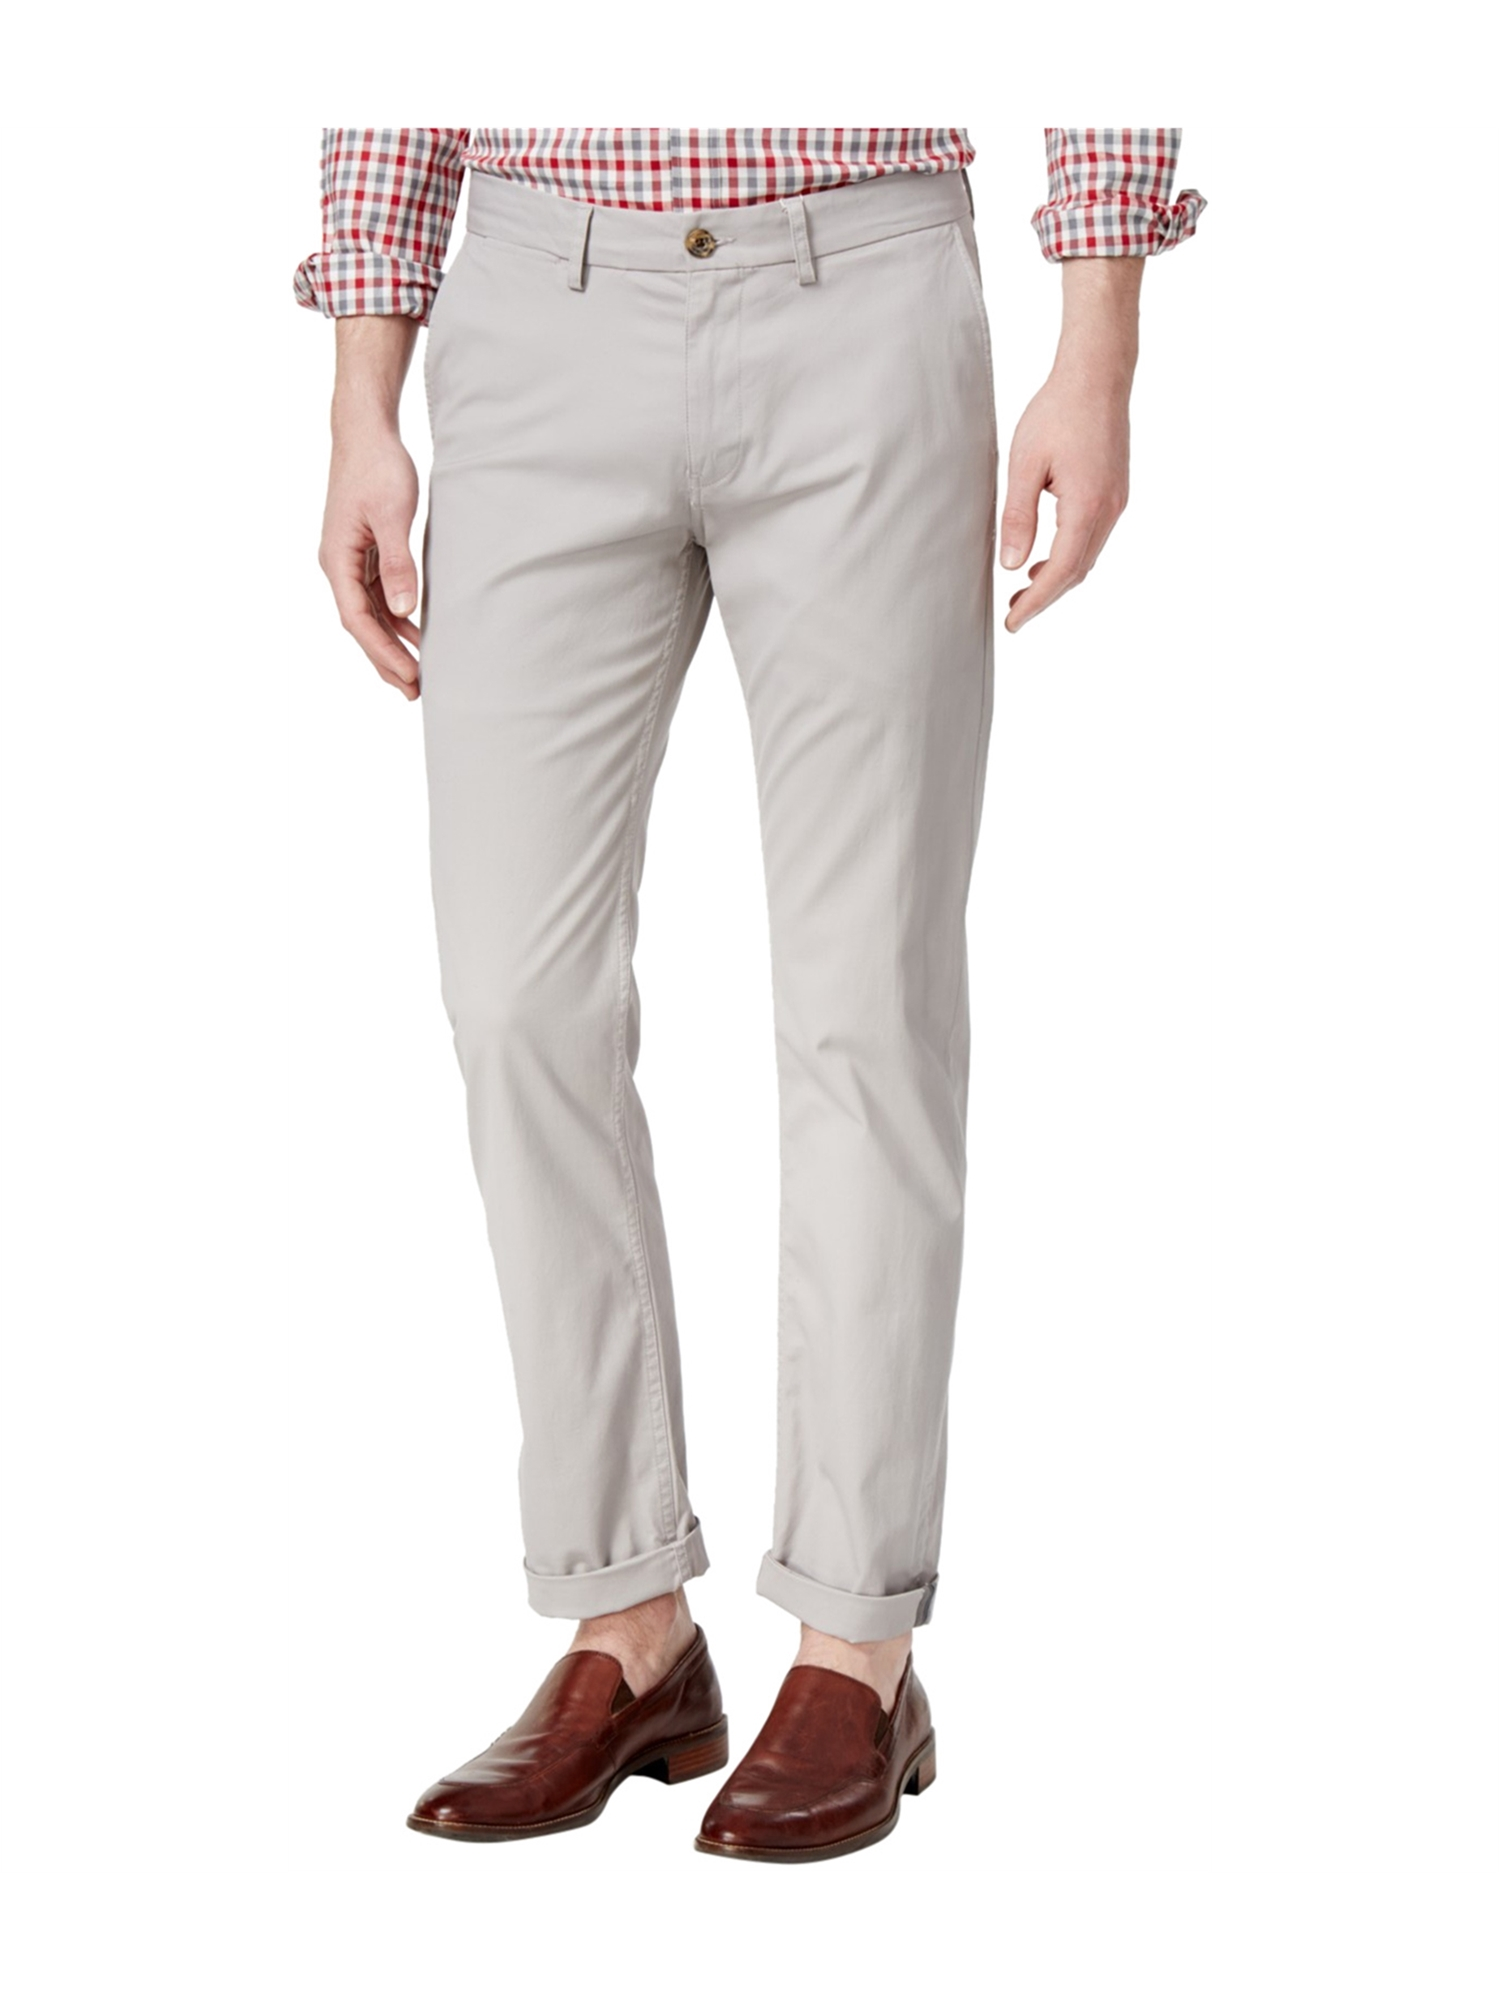 Azure Canvas Organic Cotton Kids Pull-on Long Pants-Brown